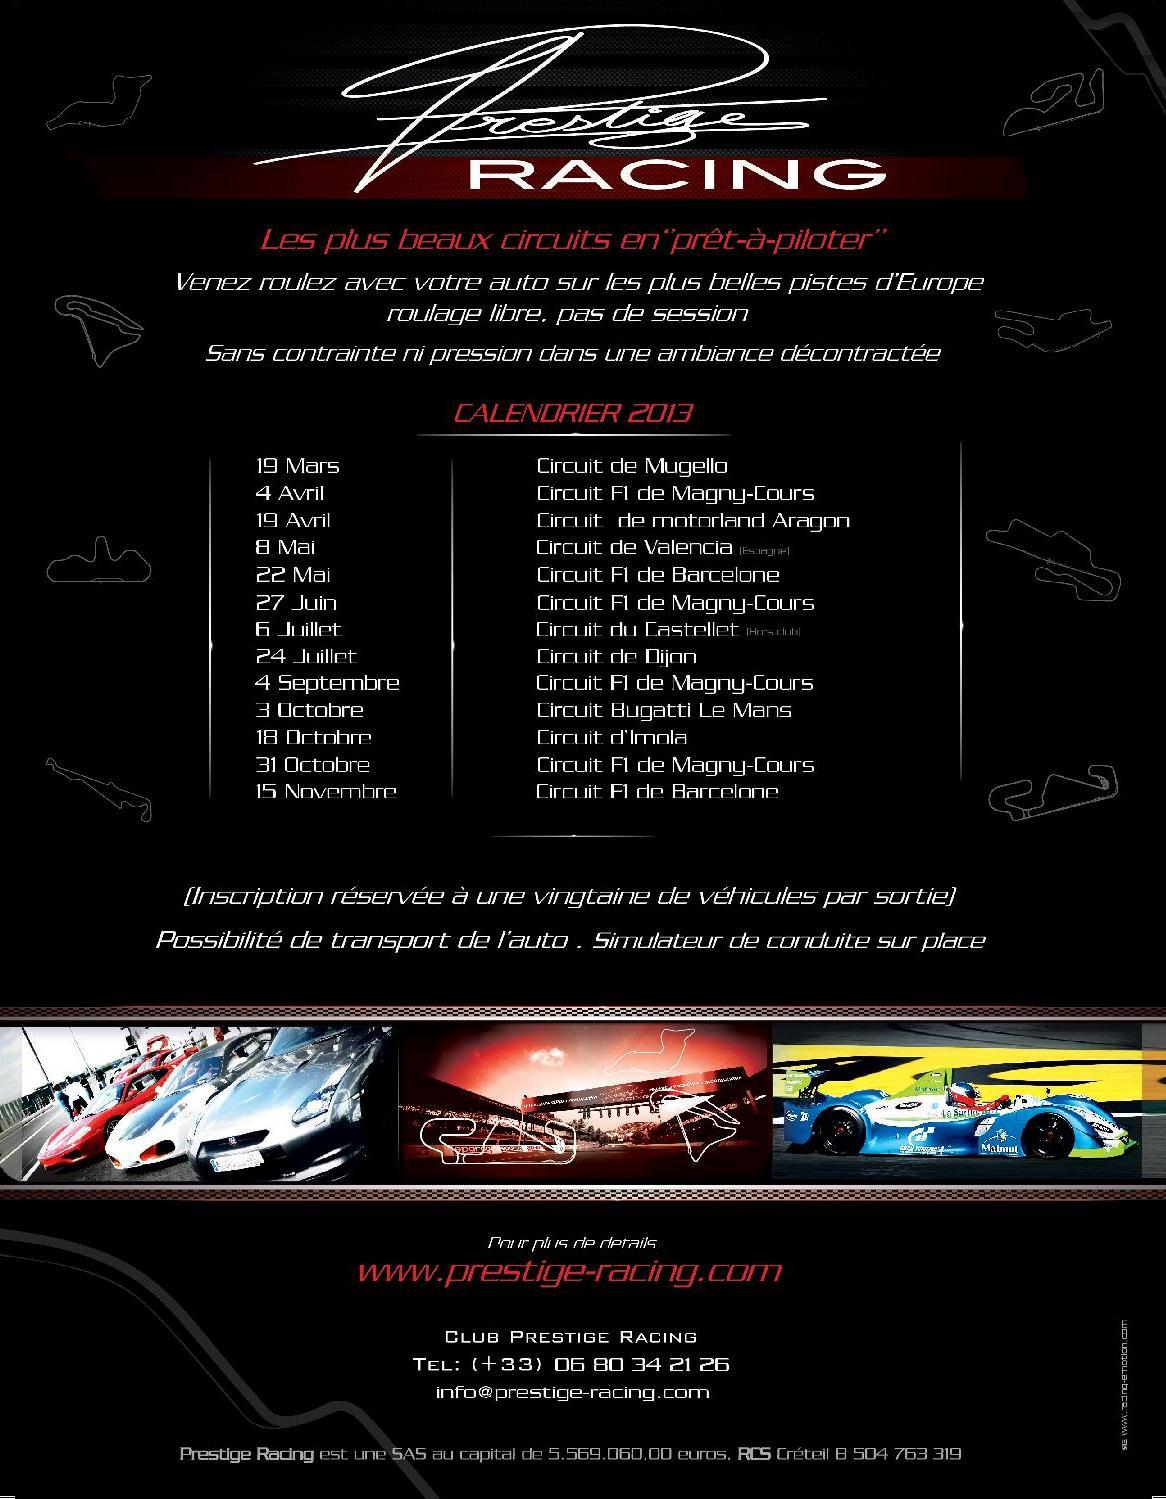 http://www.prestige-racing.com/